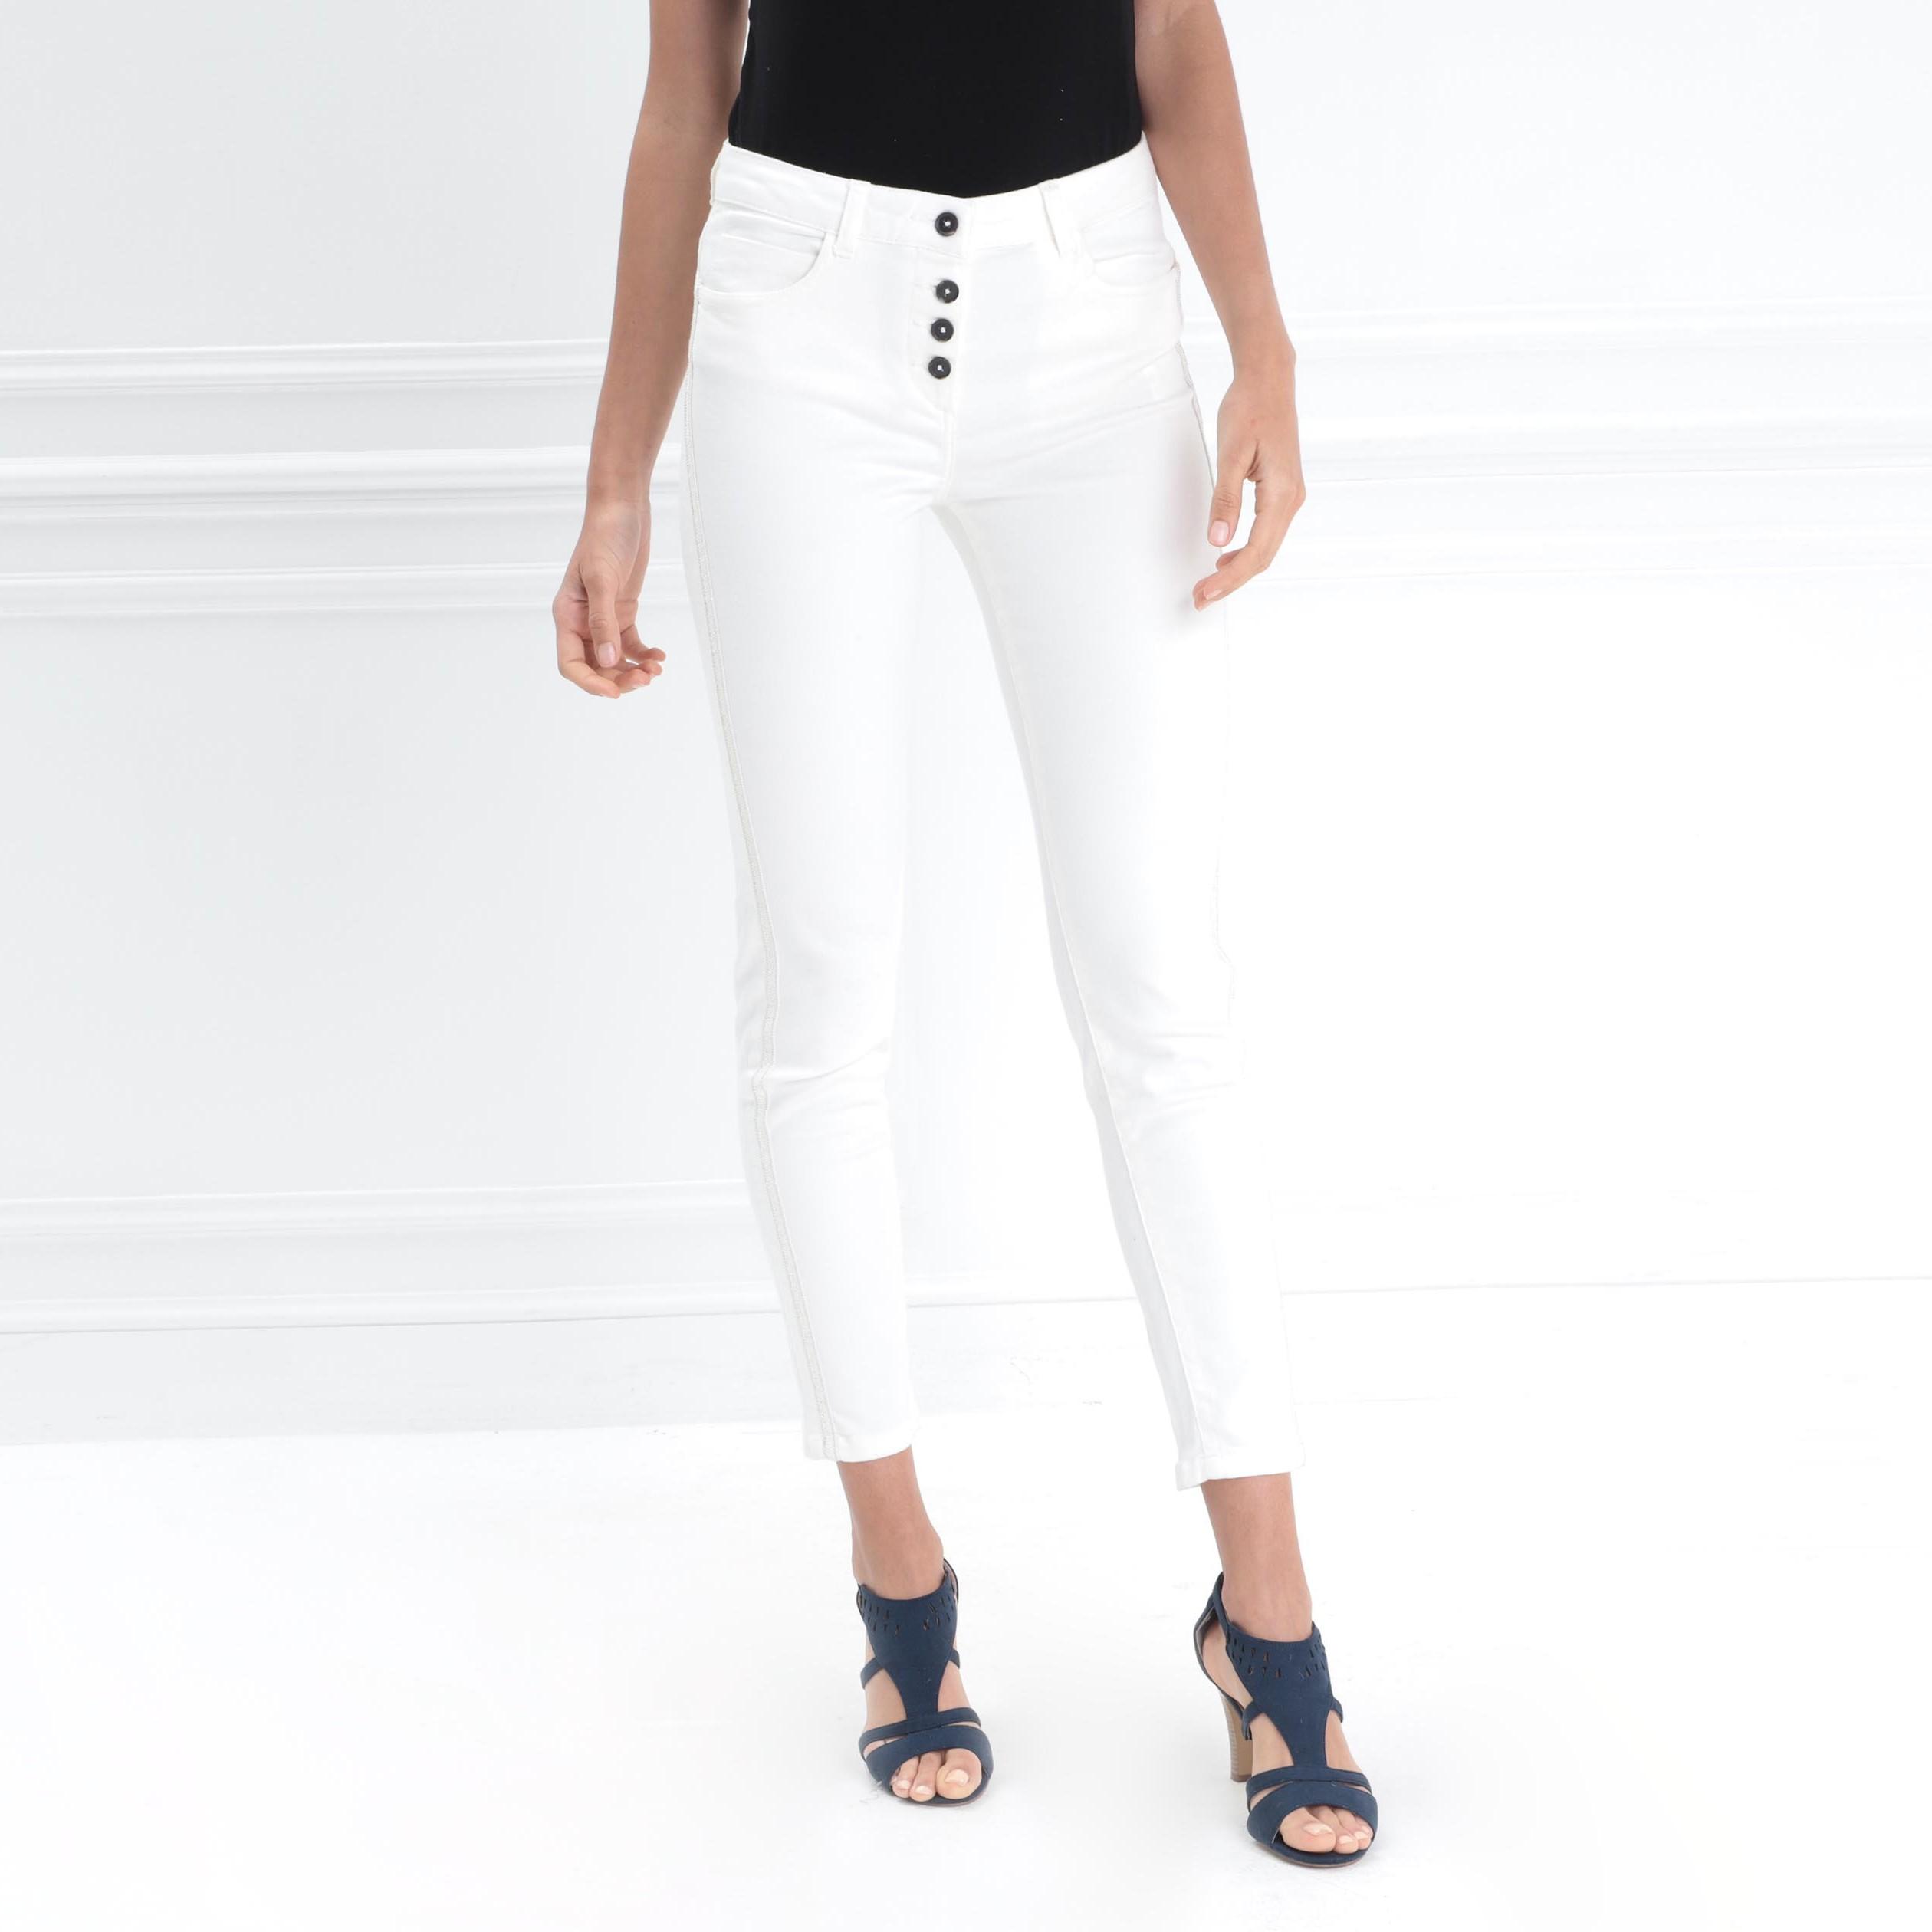 Ecru Taille Femme Haute Slim Pantalon 6mbY7yvIfg